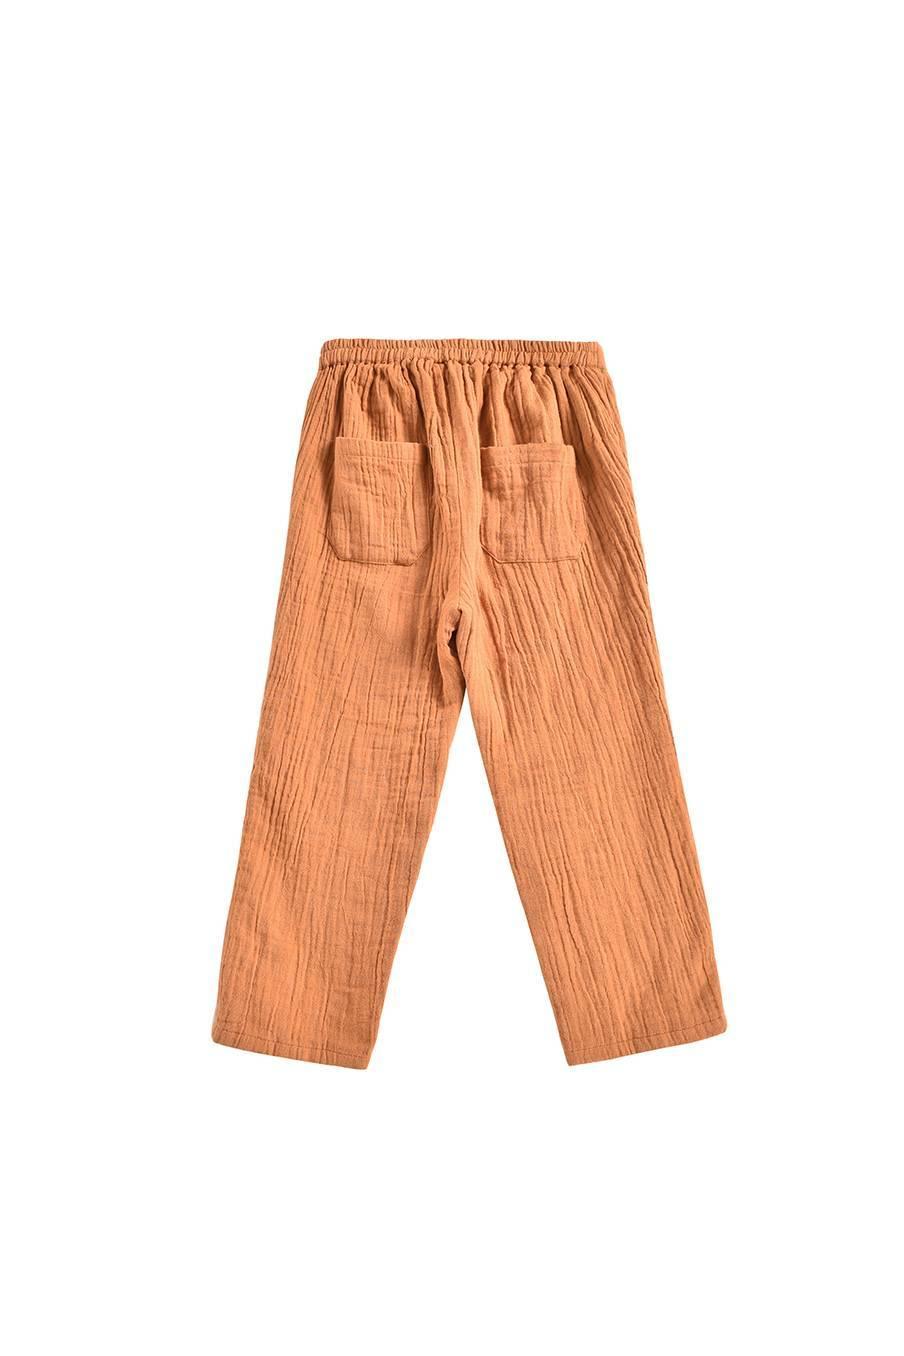 boheme chic vintage pantalon bébé garcon acilu dark safran